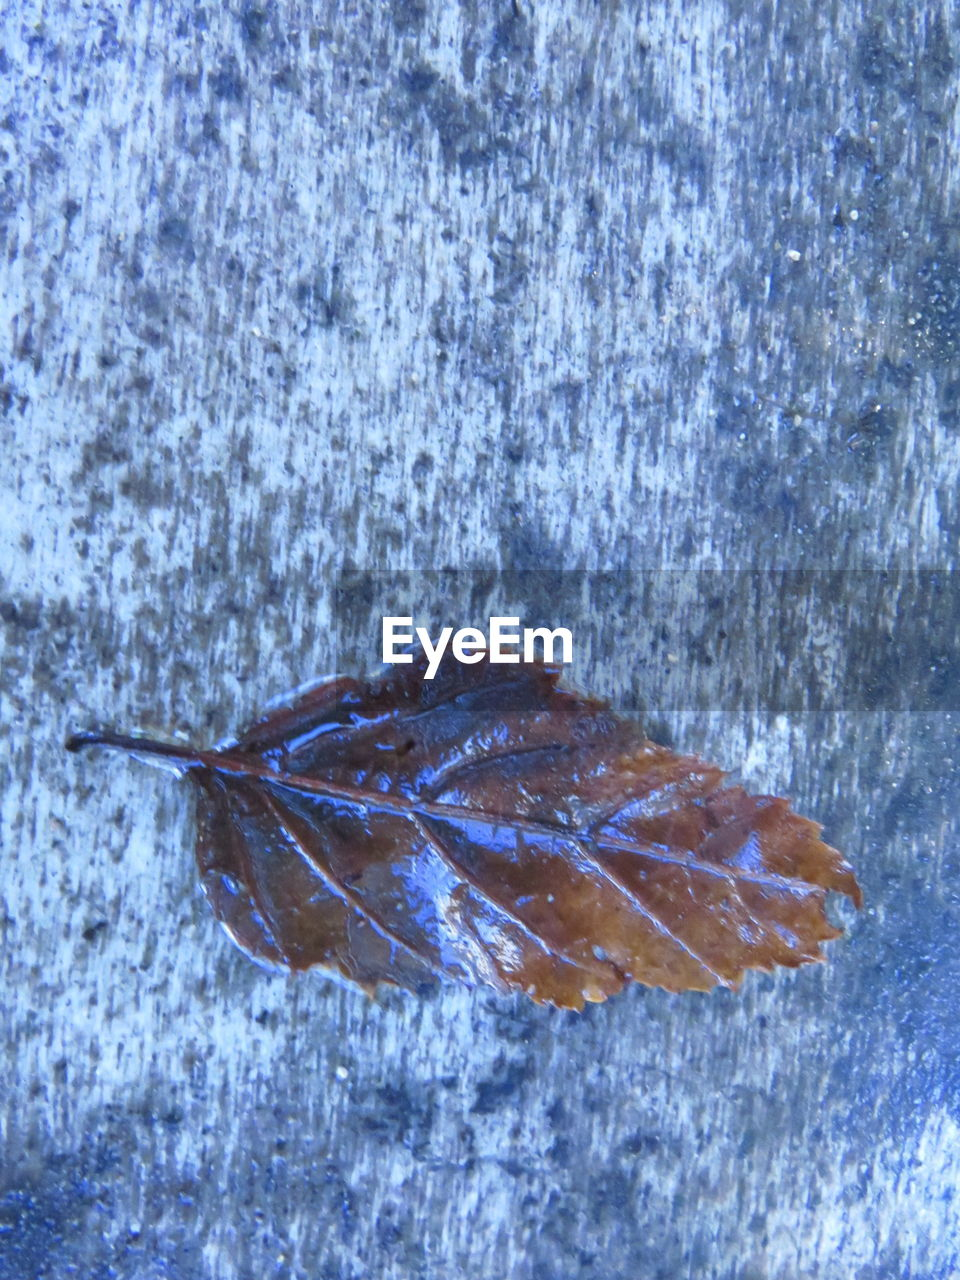 Directly above shot of fallen leaf on wet wood